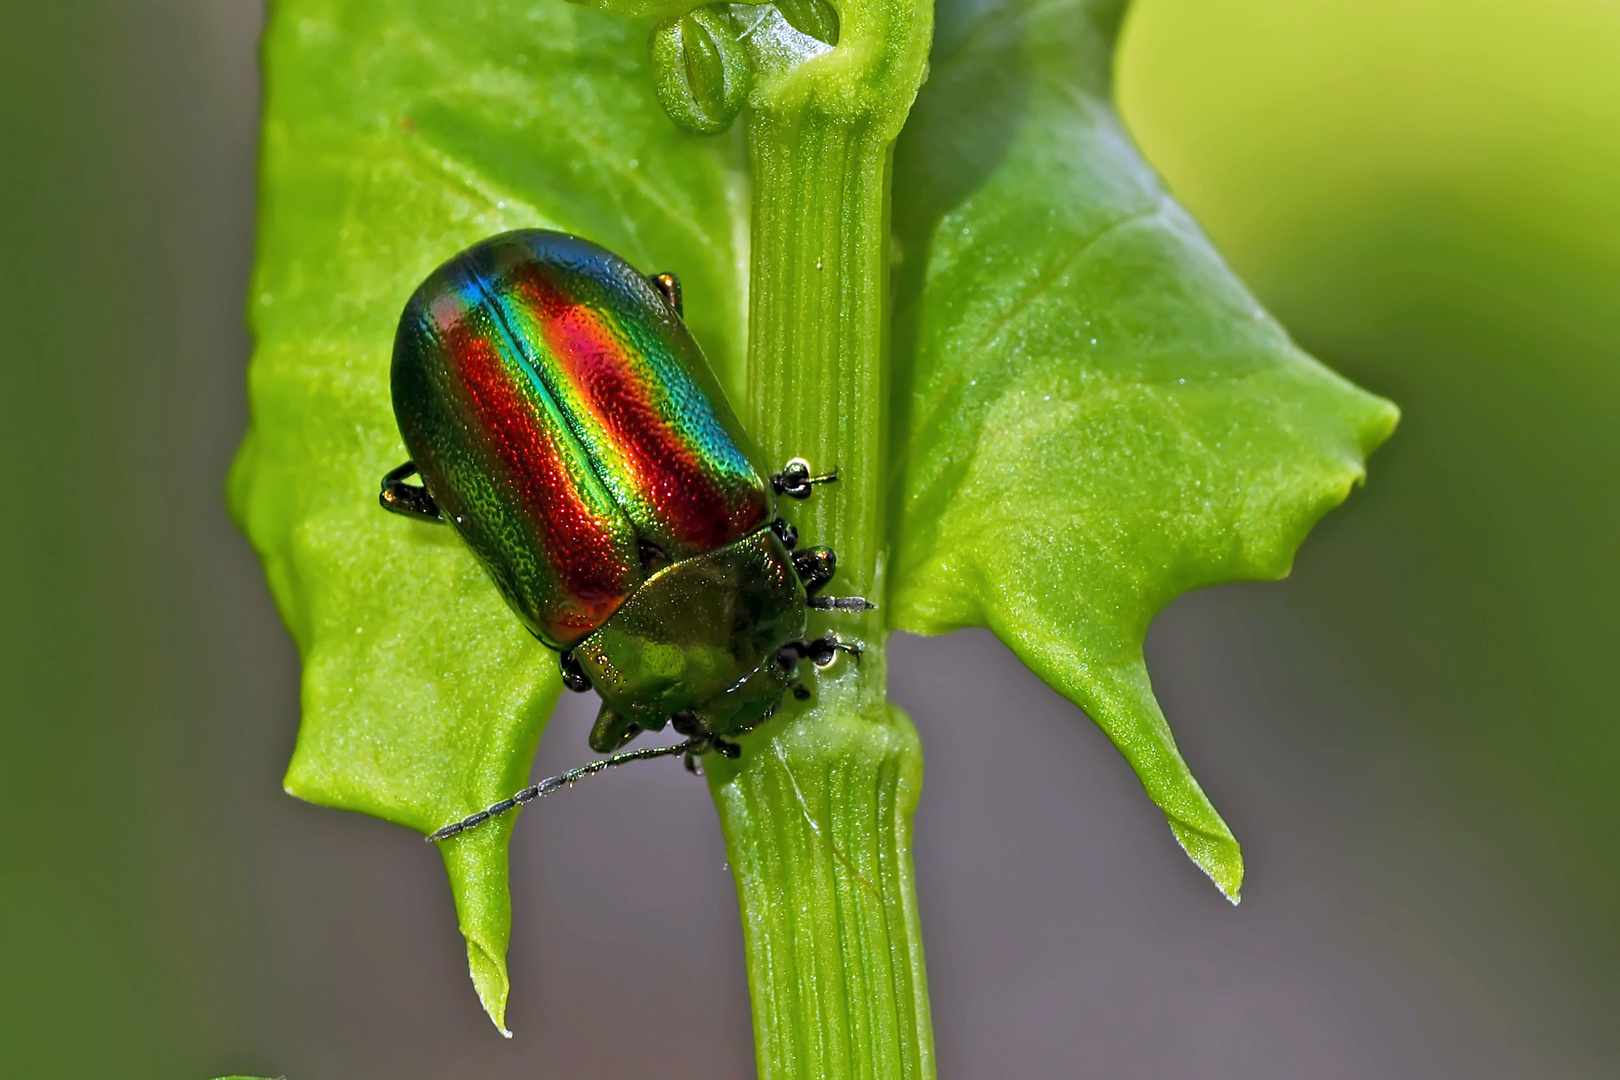 Regenbogen-Blattkäfer (Chrysolina cerealis) - Un coléoptère comme un arc-en-ciel!